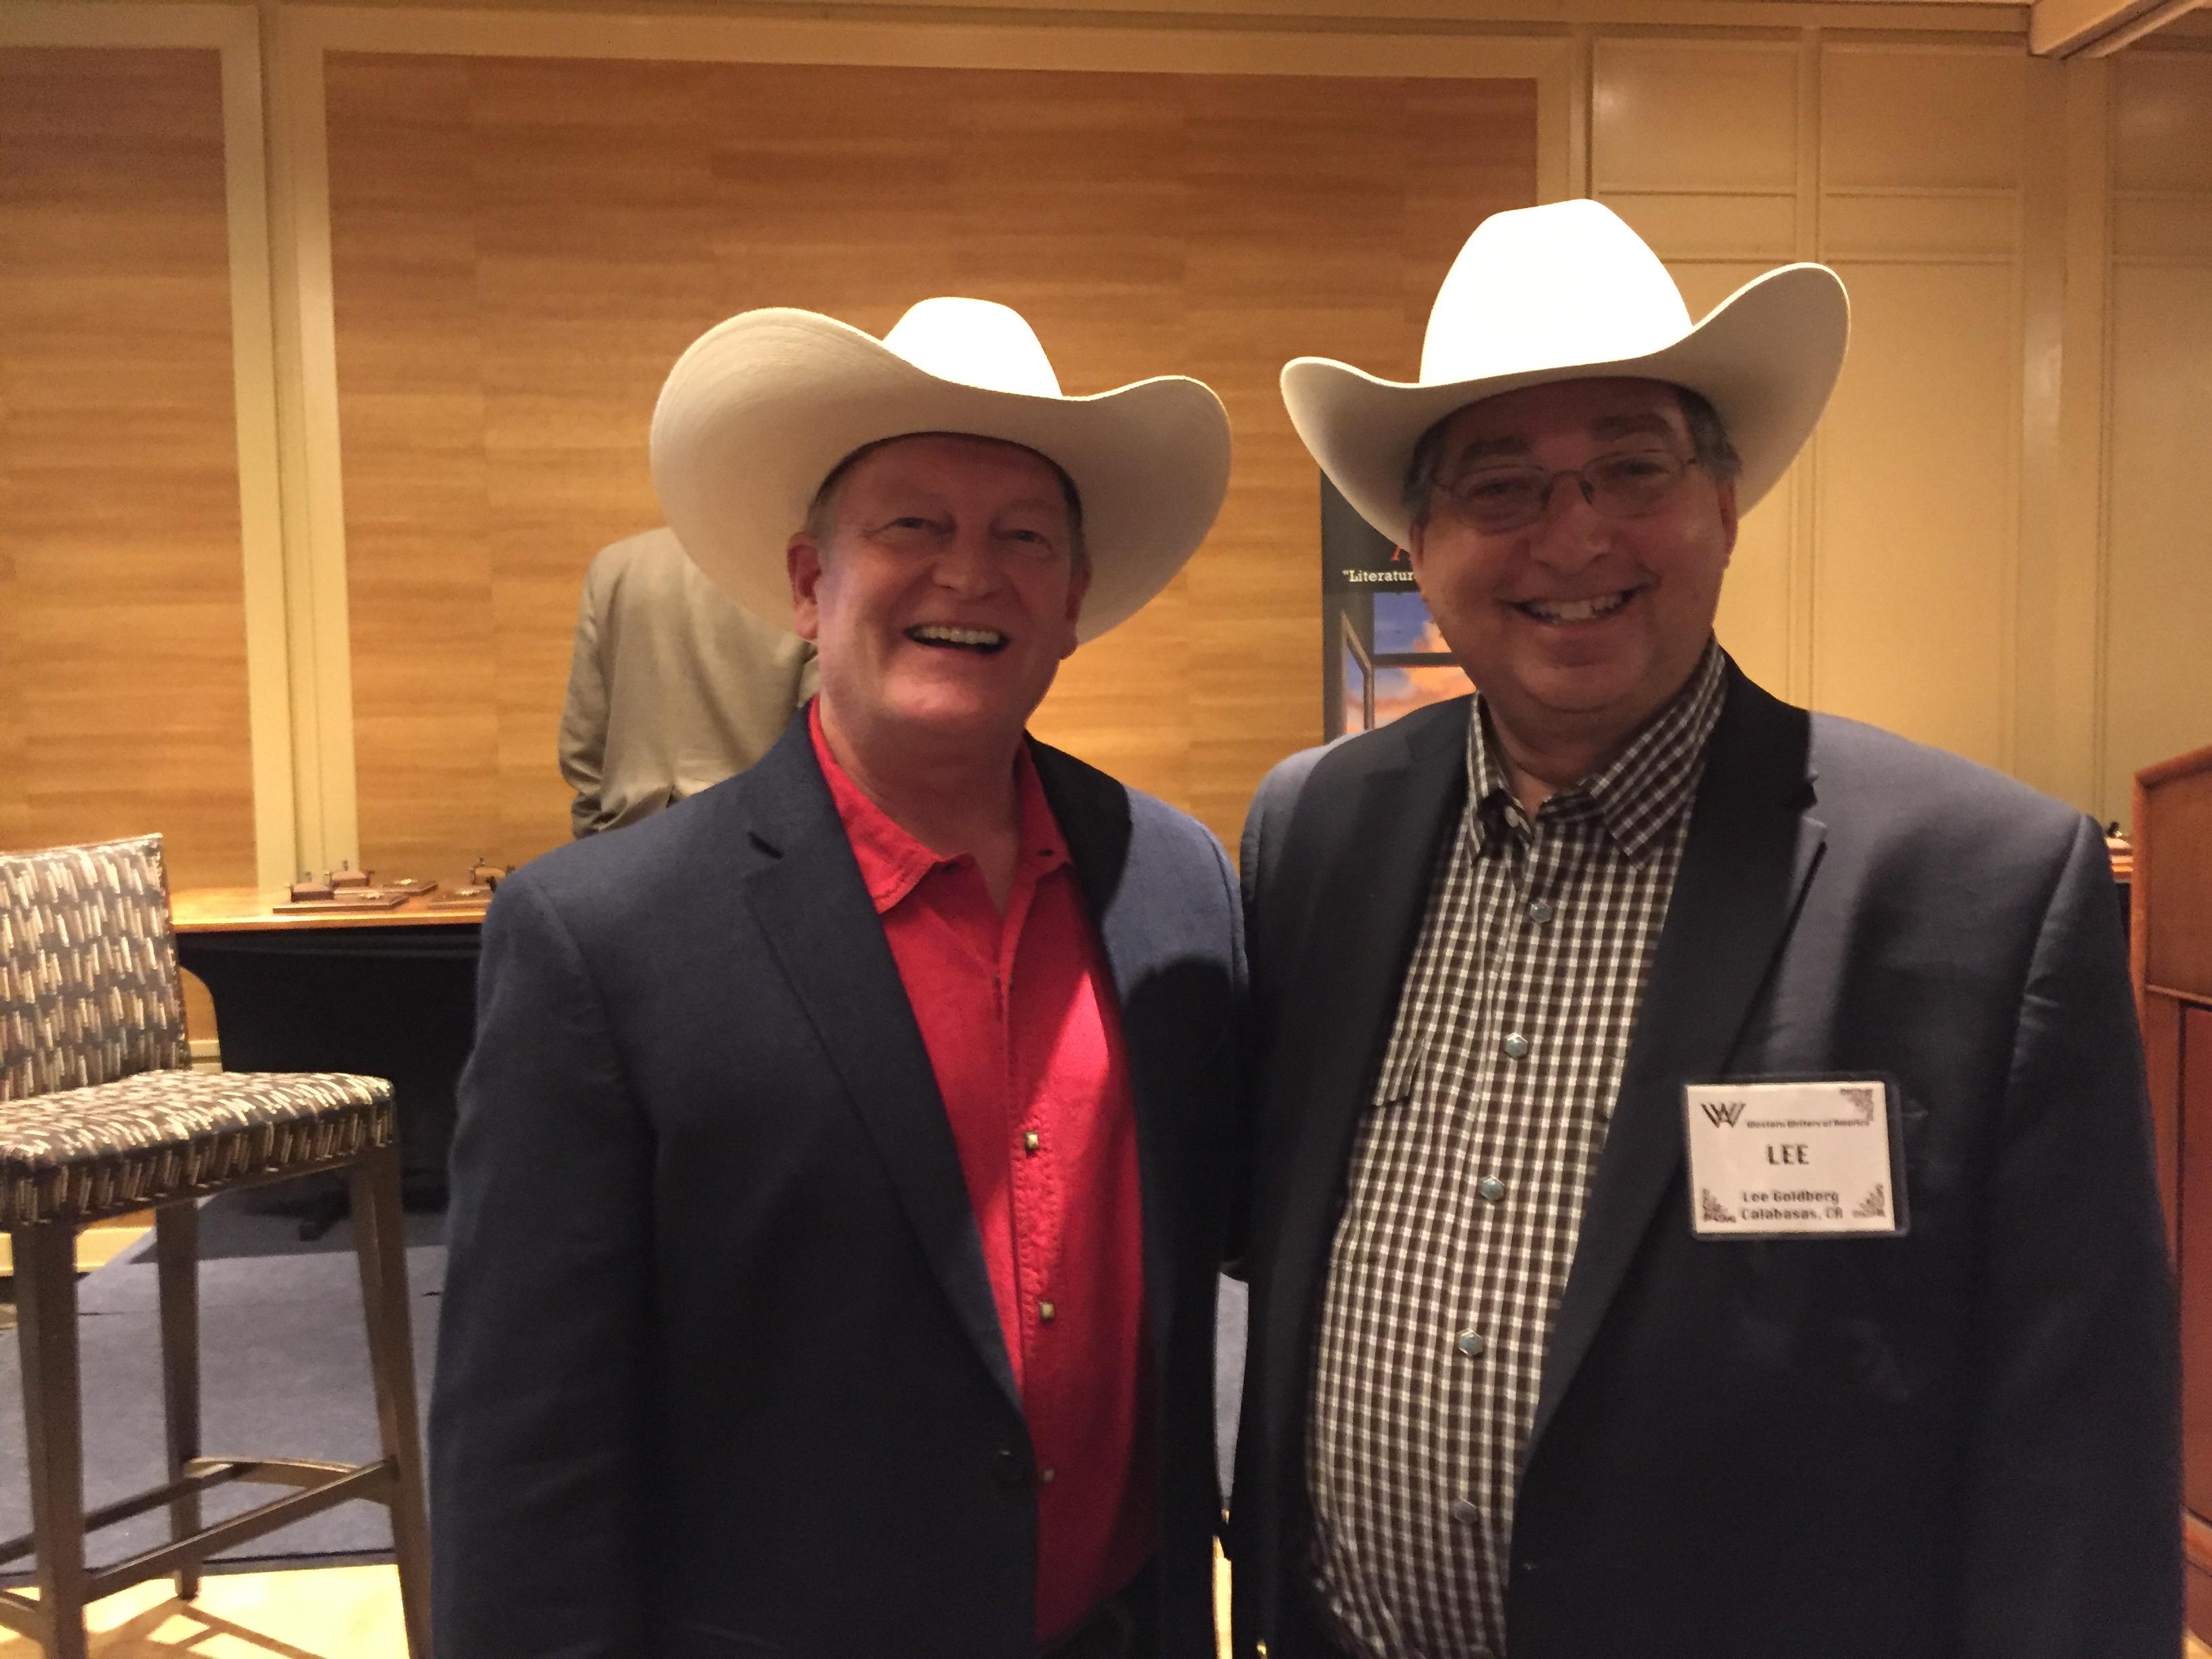 Craig Johnson and Lee Goldberg at the 2018 Spur Awards in Billings, Montana.